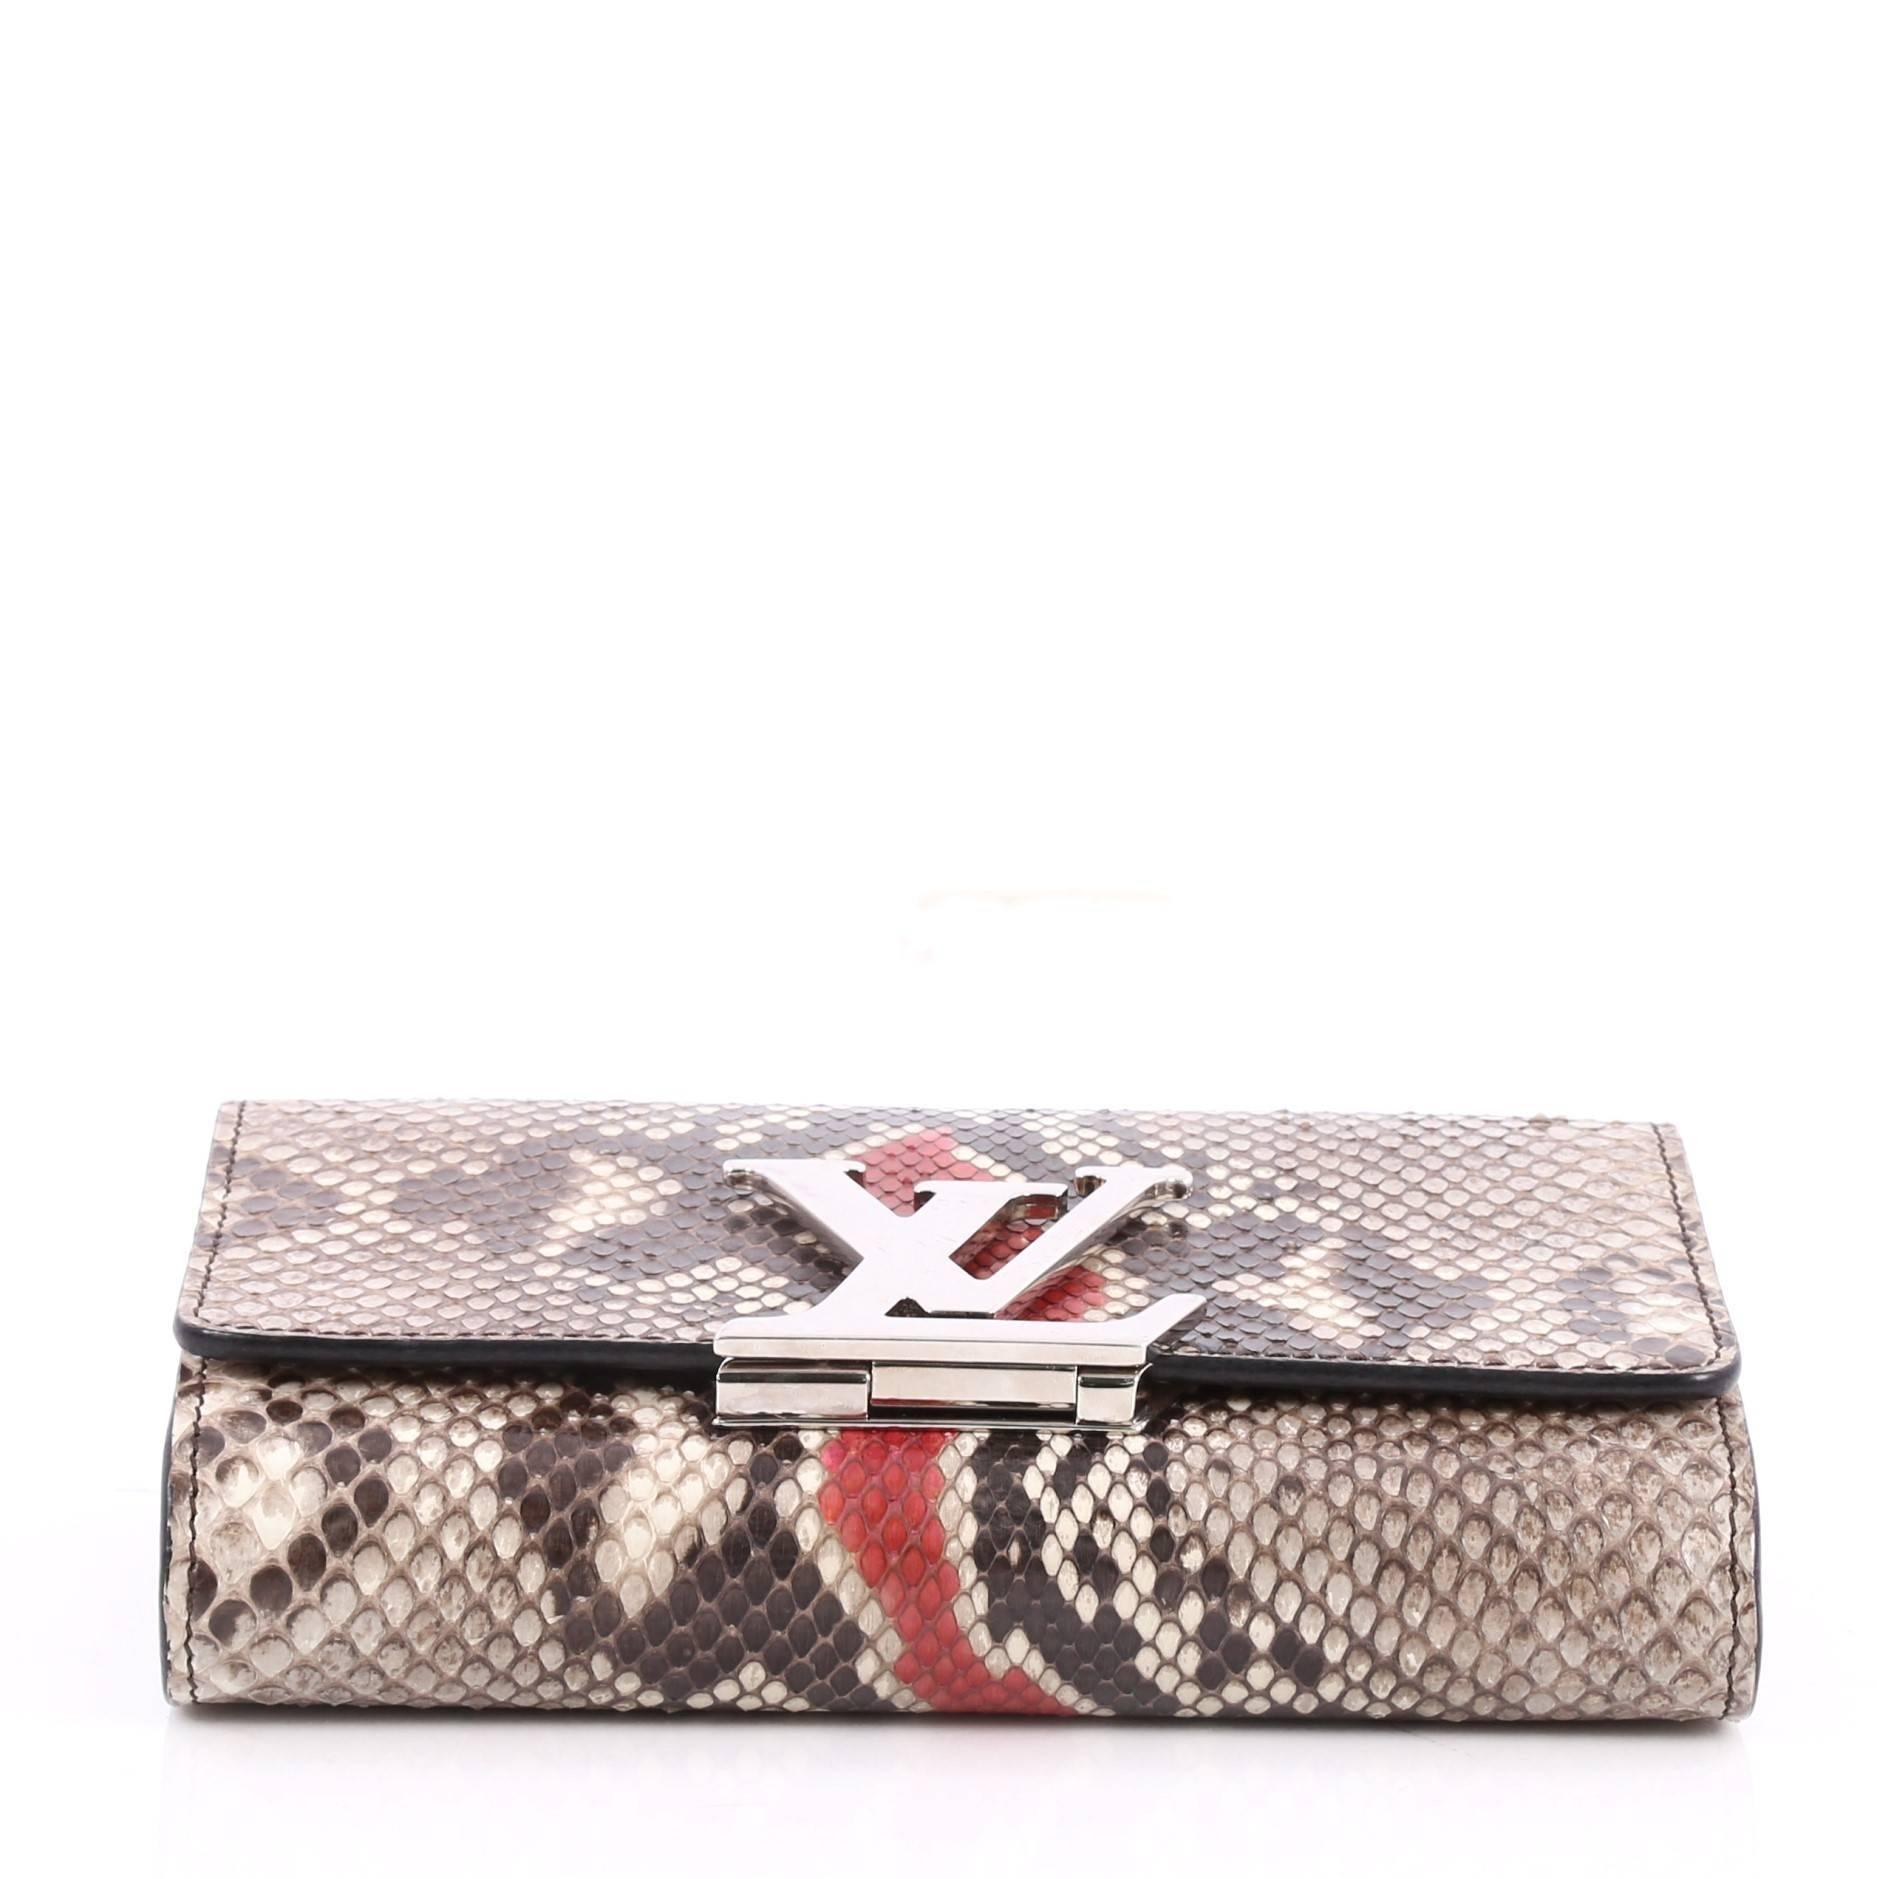 Louis Vuitton Chain Louise Clutch Python GM at 1stdibs 79fb3dfcd58